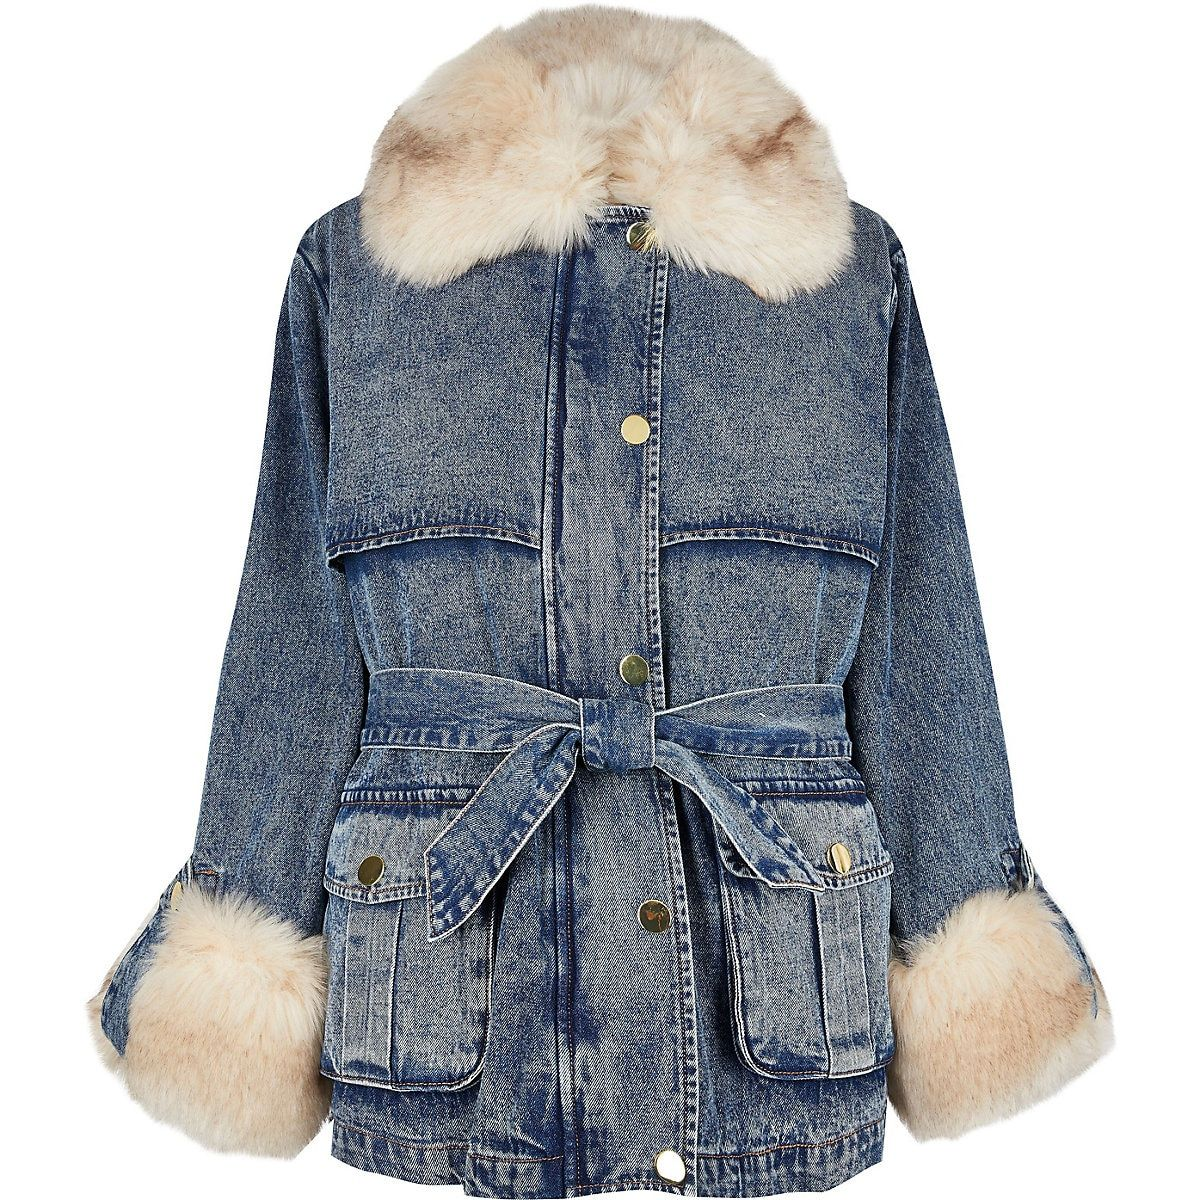 Blue Faux Fur Collar Padded Denim Jacket River Island Denim Jacket Winter Coats Women Jackets [ 1200 x 1200 Pixel ]